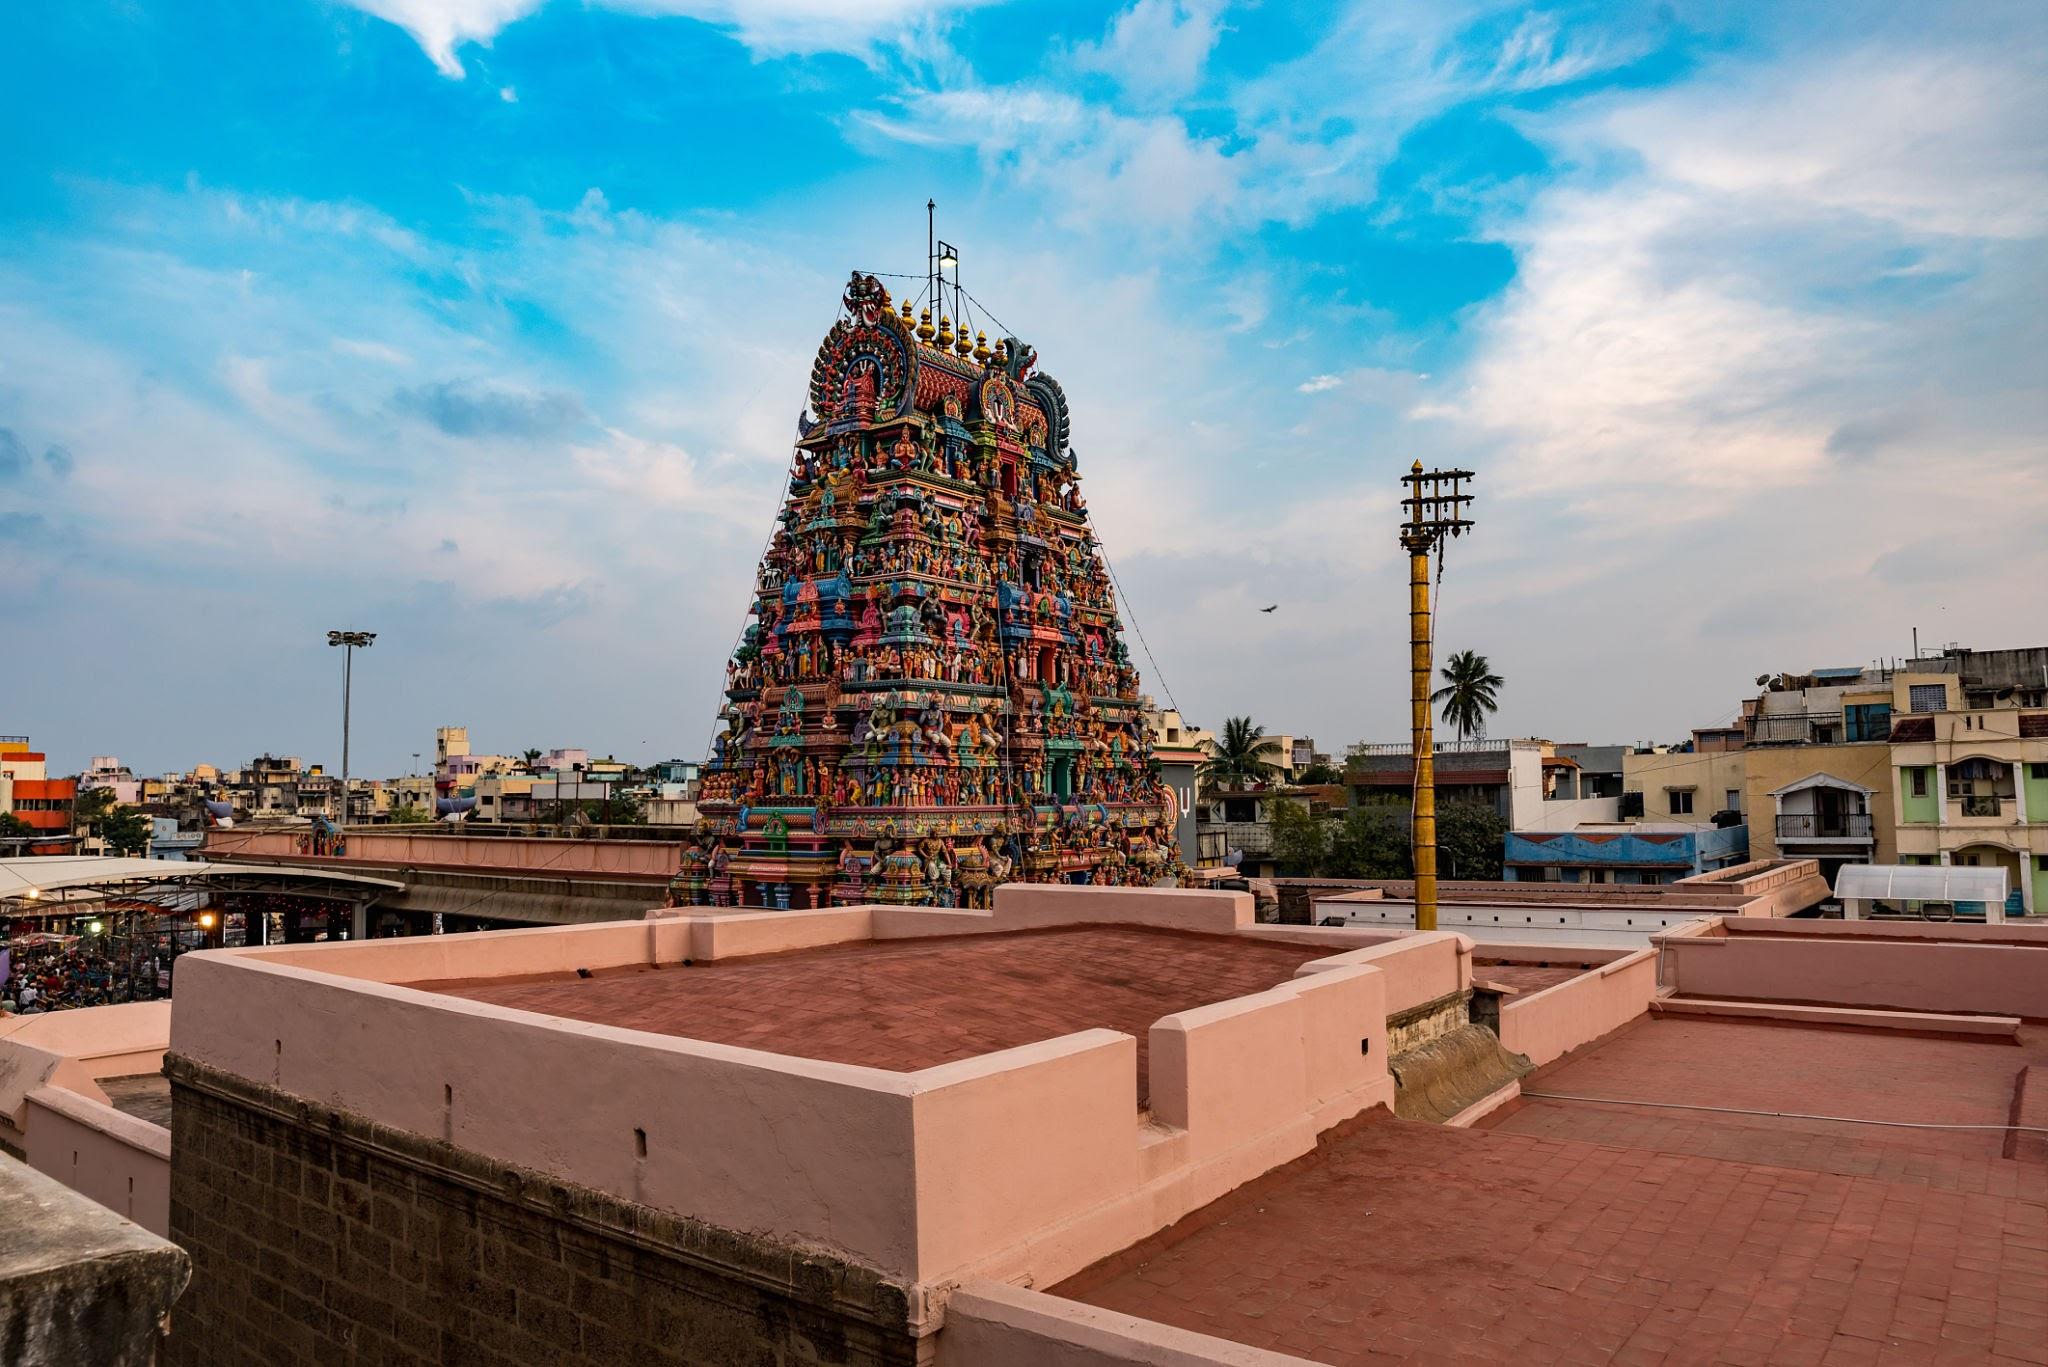 Arulmigu Sri Parthasarathyswamy Temple